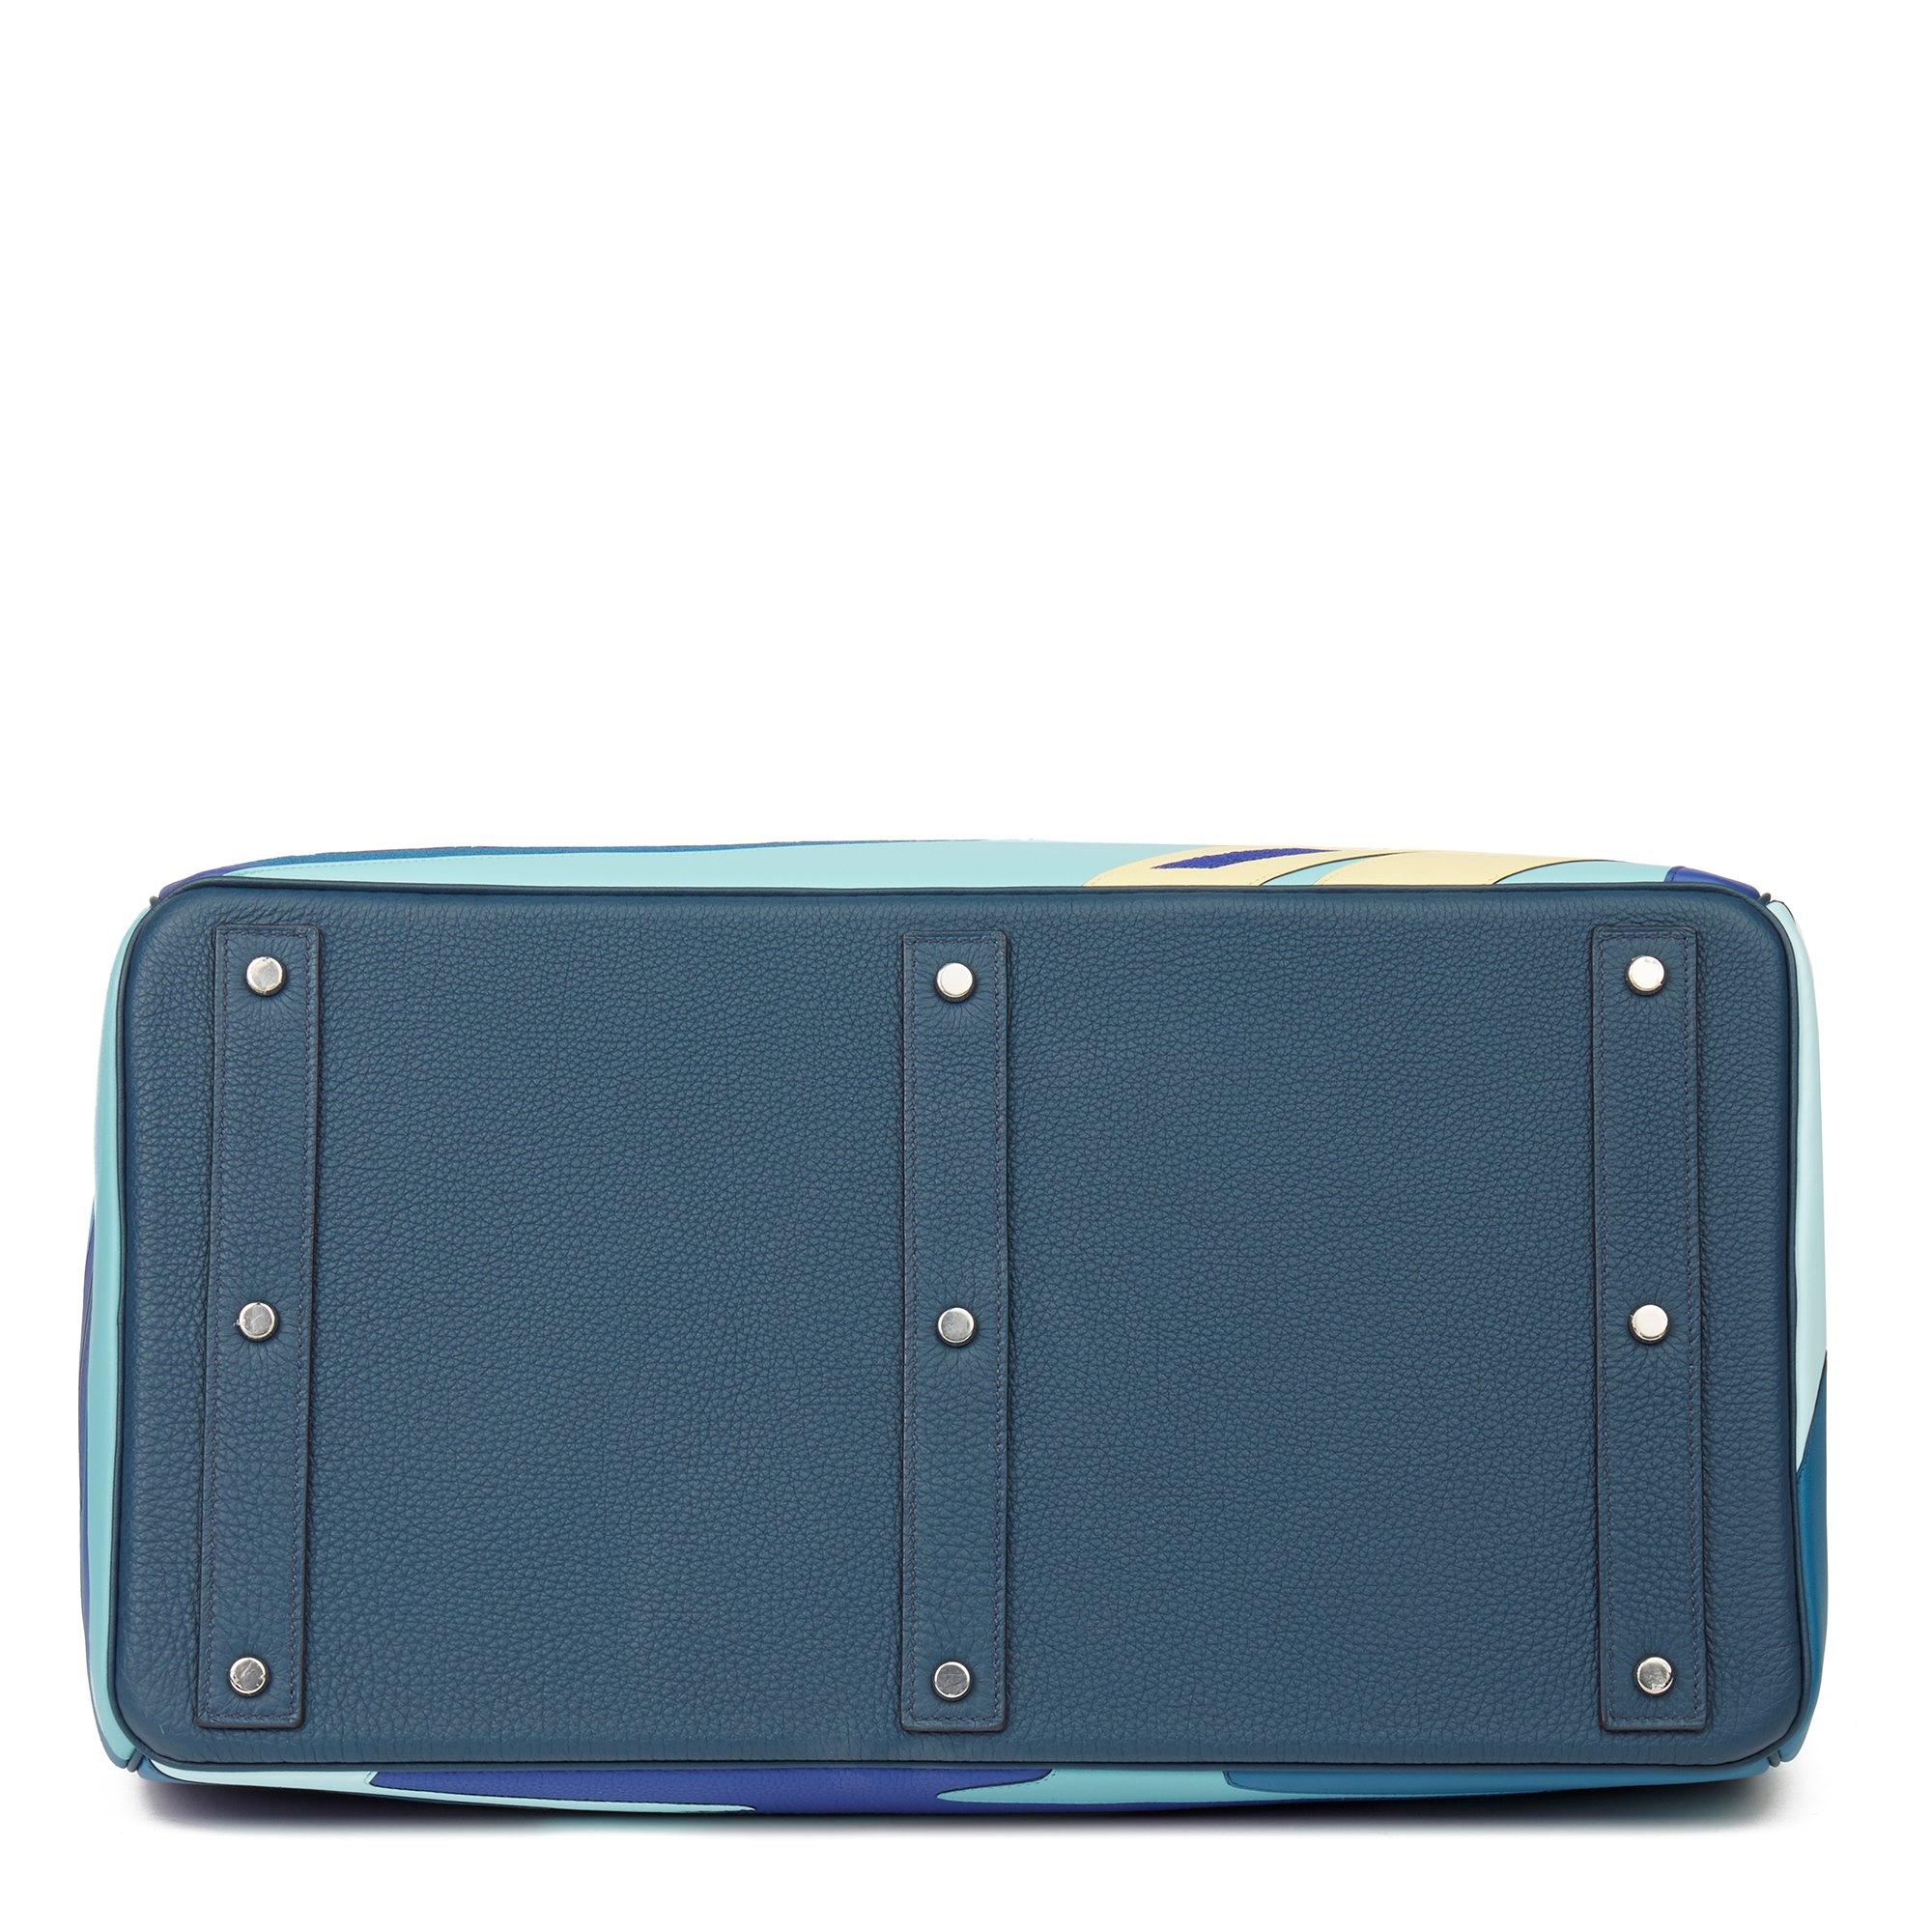 Hermès Bleu de Prusse Togo & Swift Leather Endless Road Birkin HAC 50cm